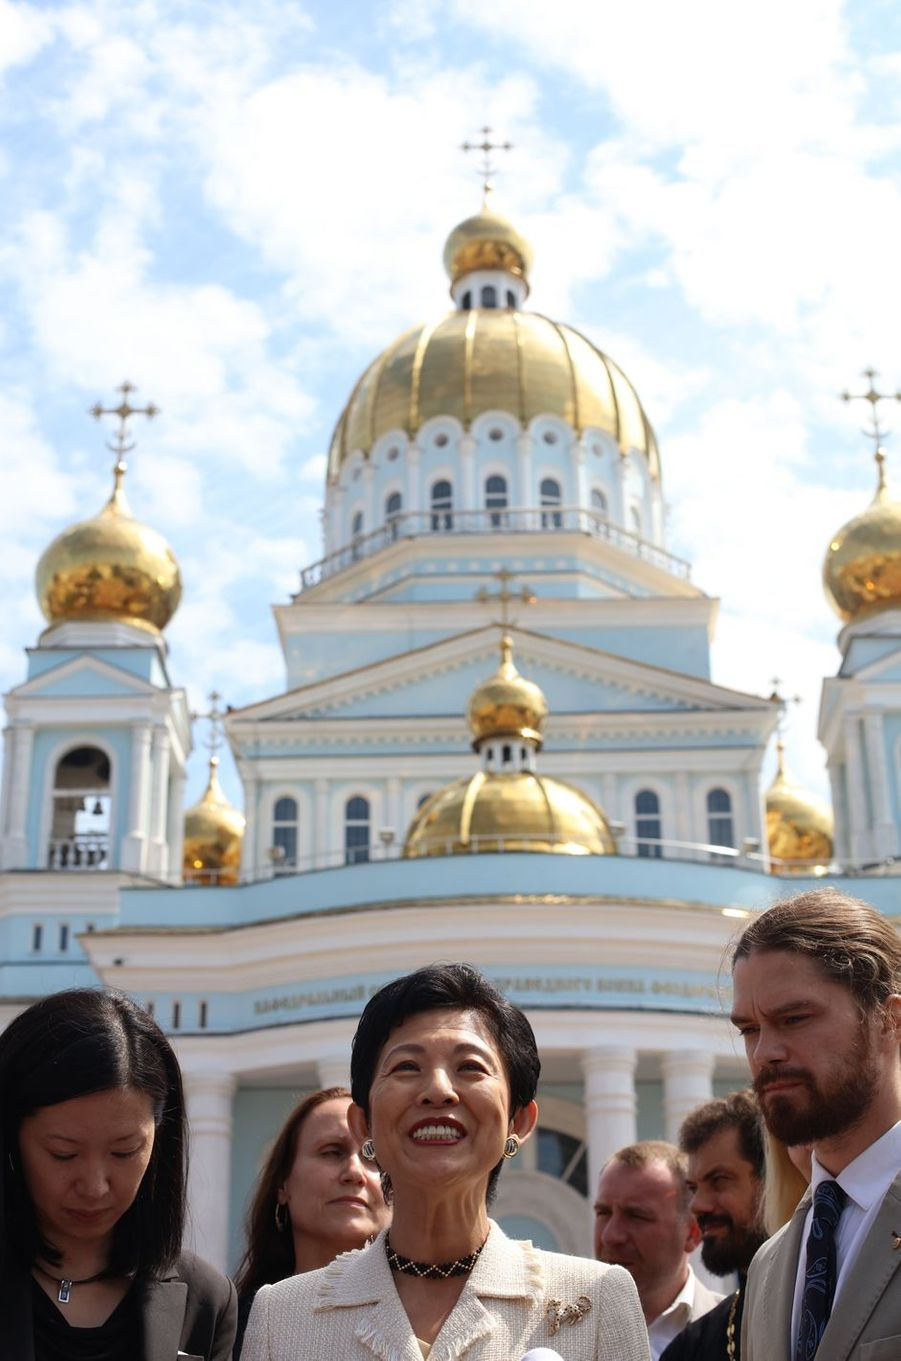 La princesse Hisako de Takamado à Saransk, le 20 juin 2018